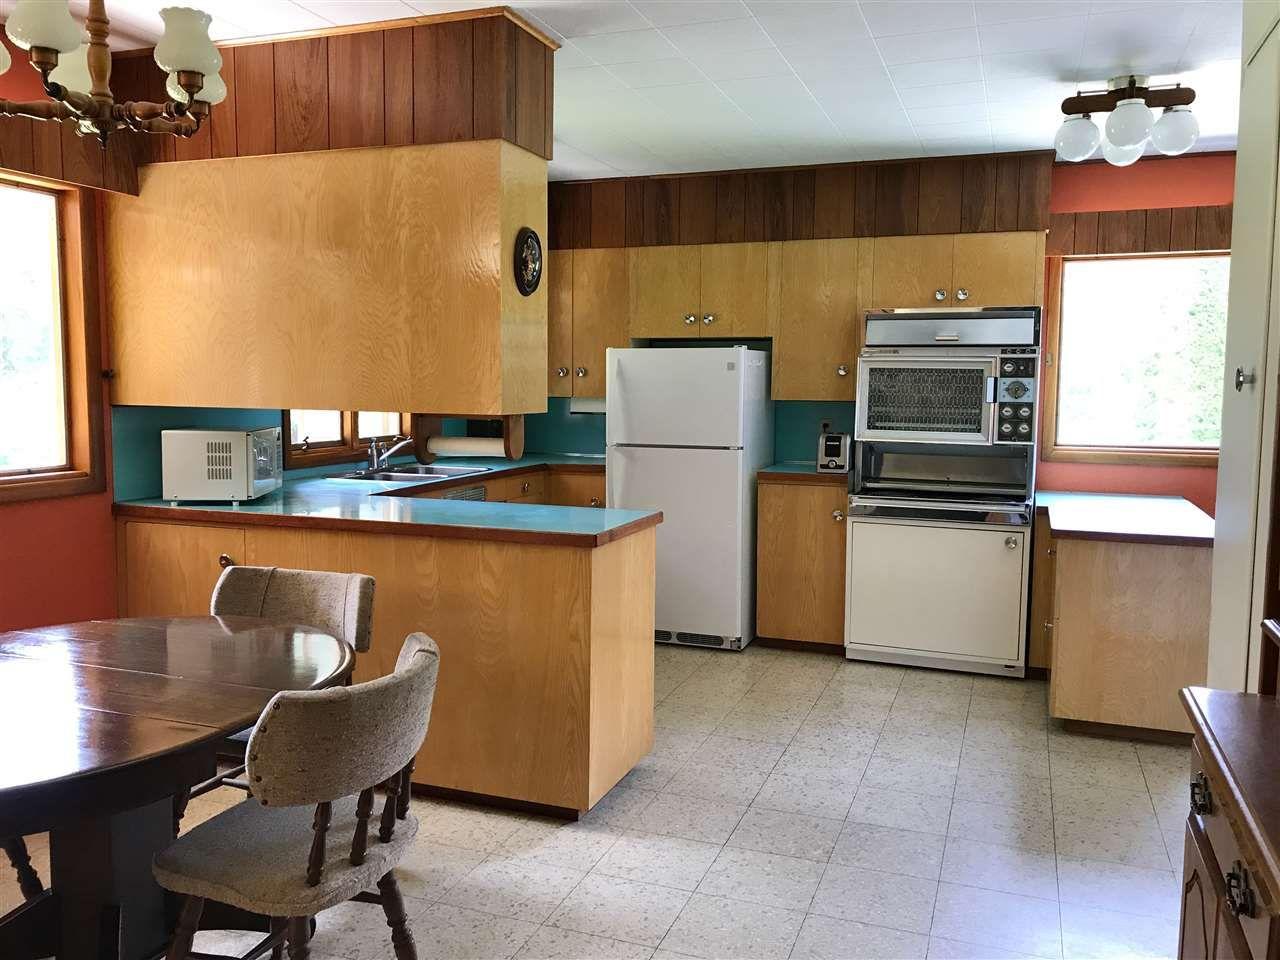 Photo 12: Photos: 944 MACKENZIE Highway in Bella Coola: Bella Coola/Hagensborg House for sale (Williams Lake (Zone 27))  : MLS®# R2482254